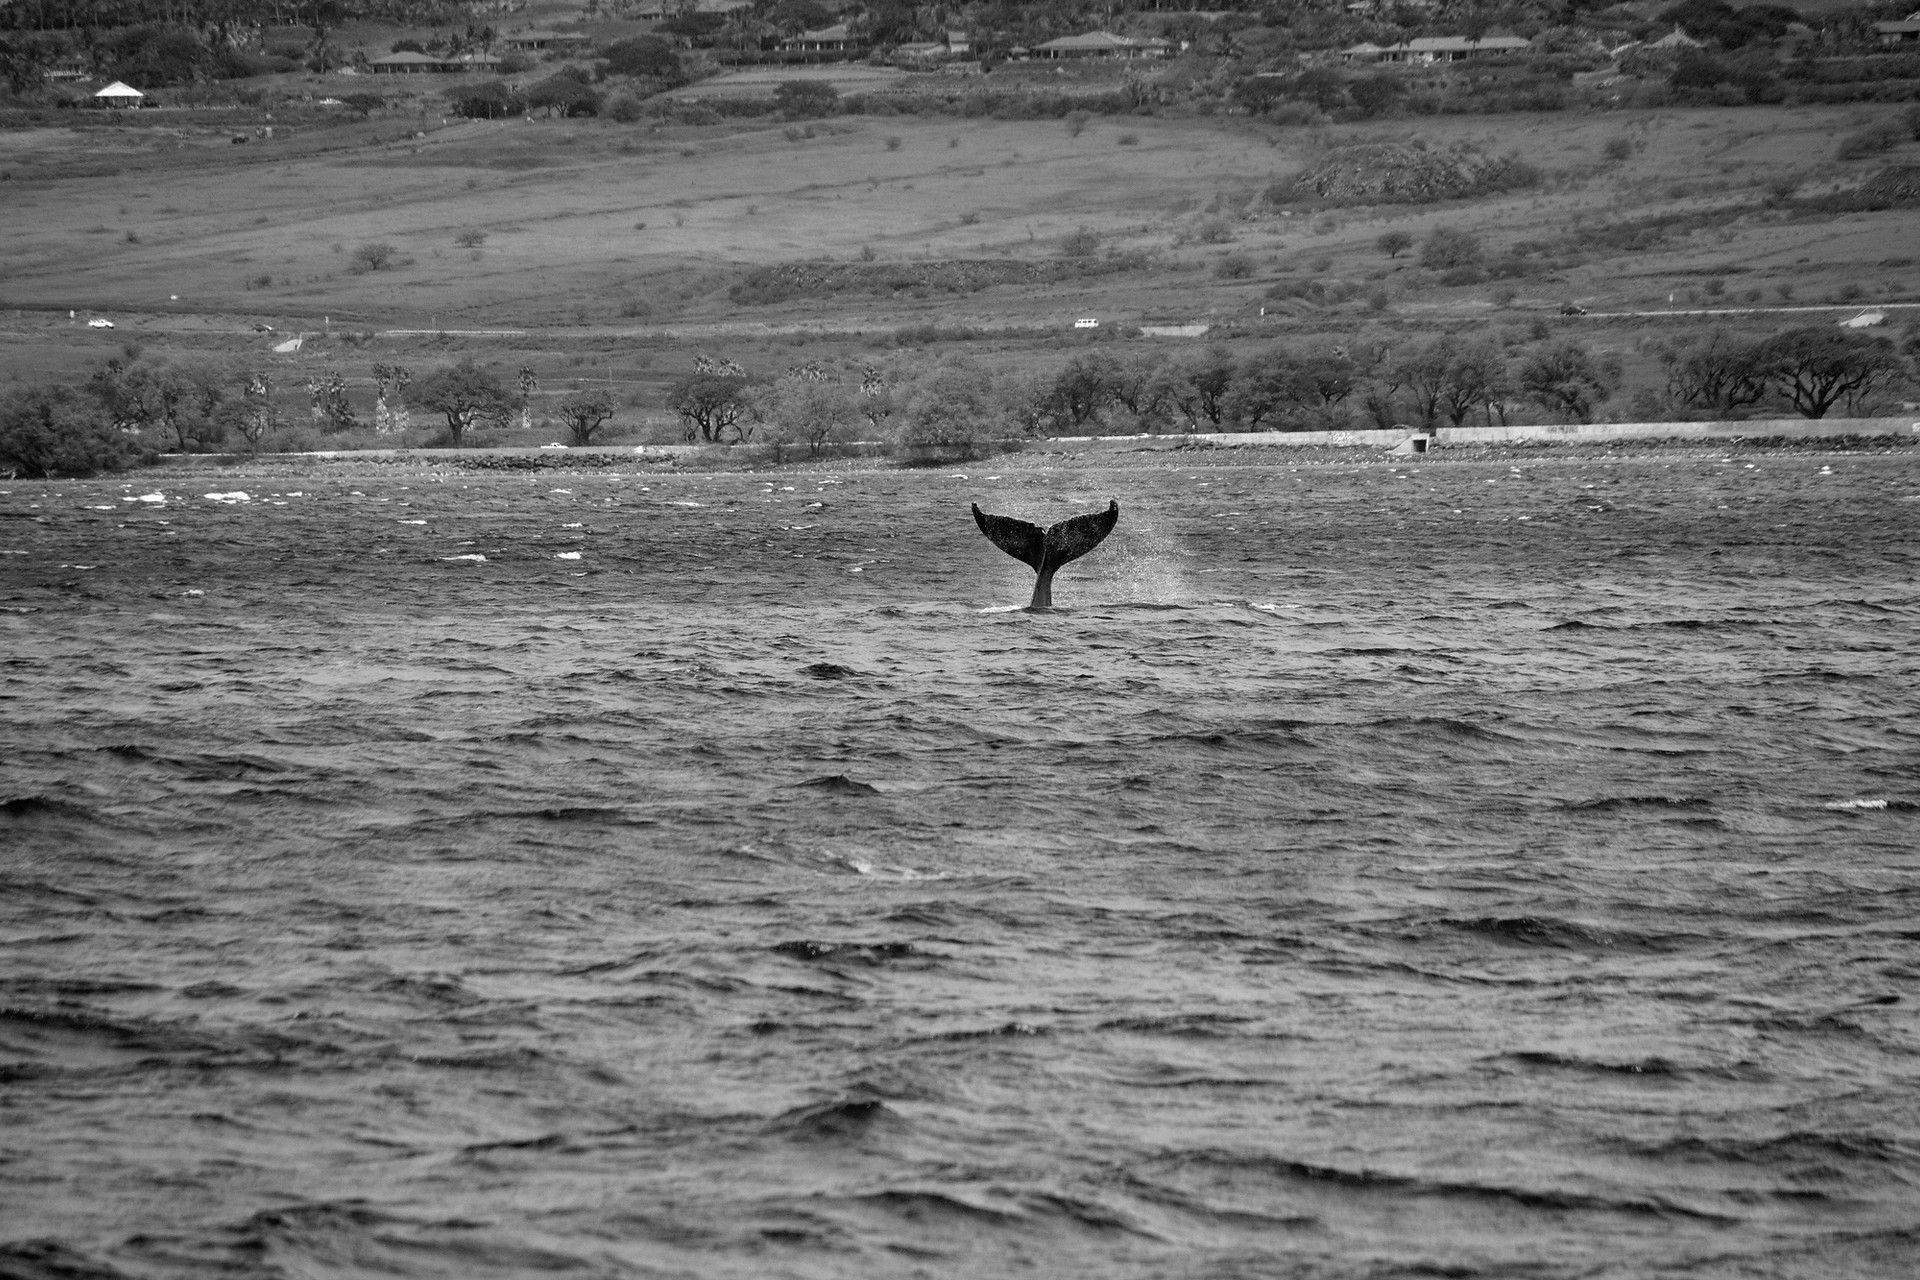 maui_whale_1.jpg